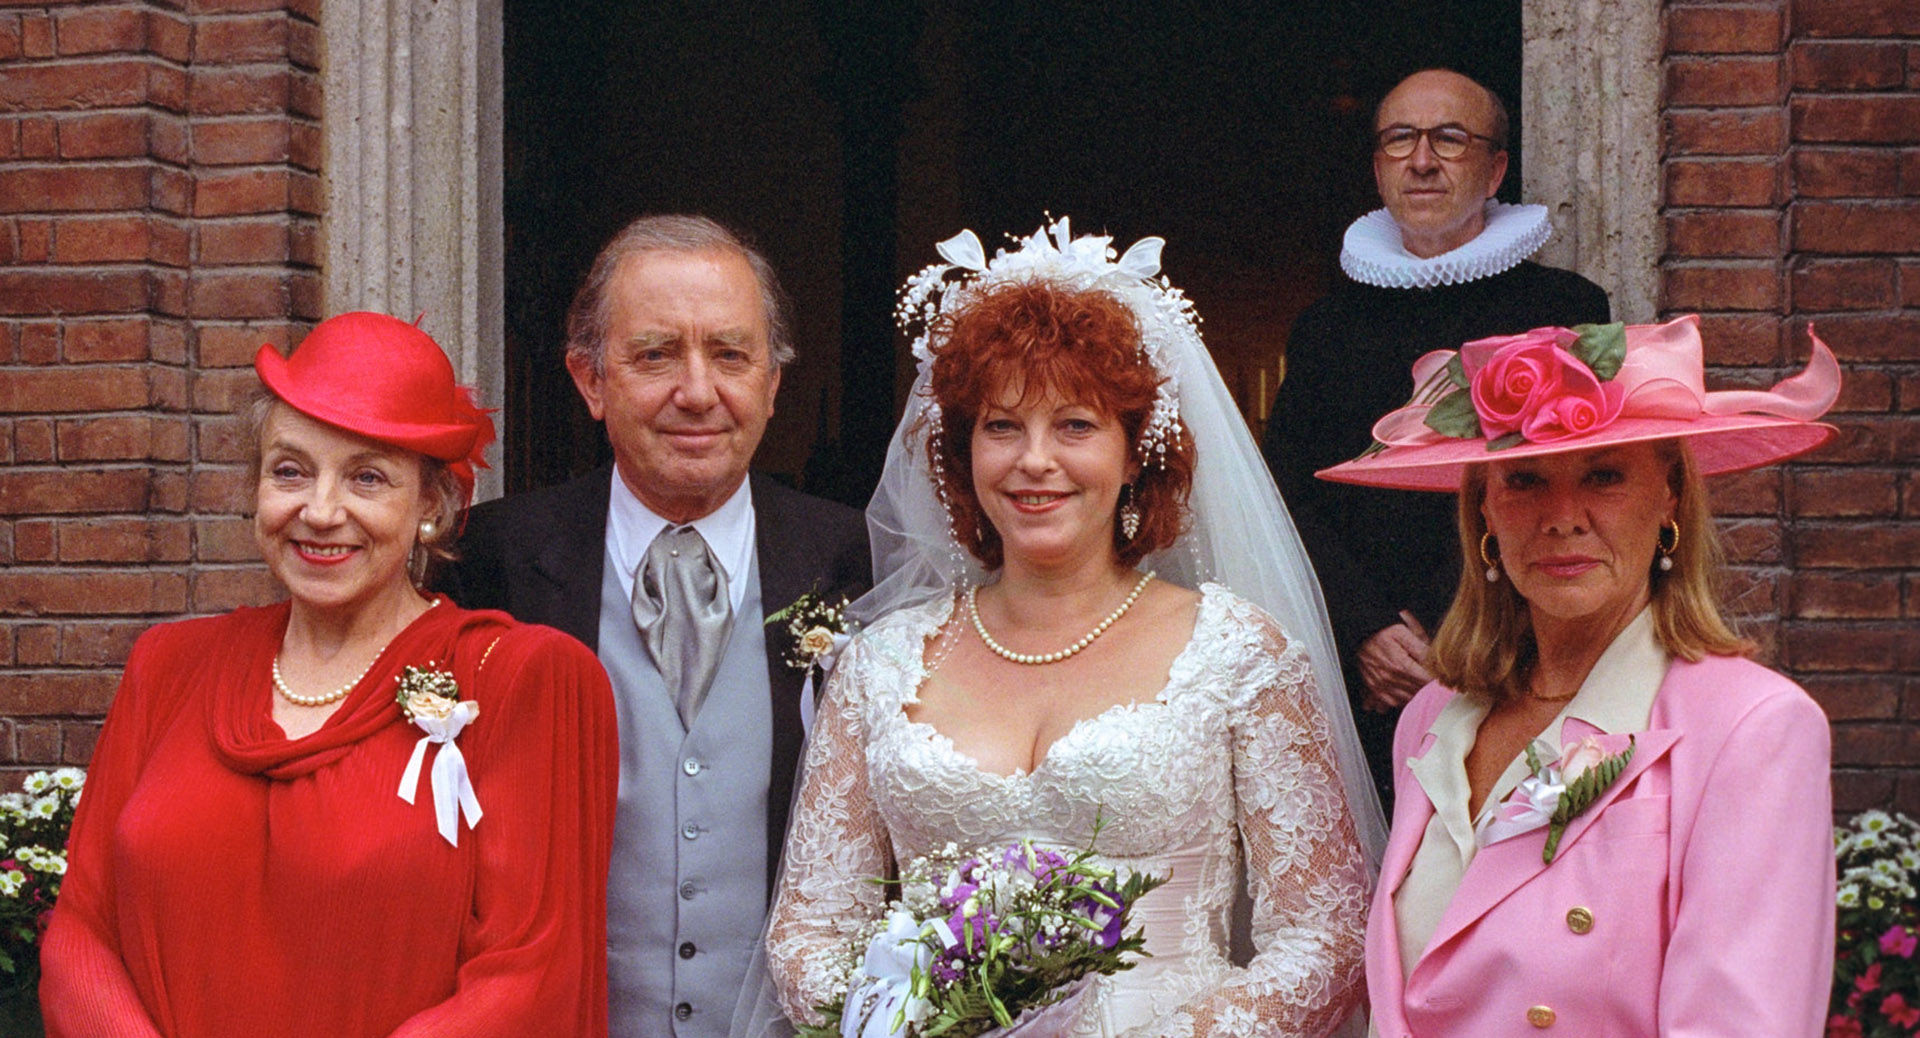 Monika John (Hennys Mutter), Hans Clarin (Hennys Vater), Elfi Eschke (Henny), Gert Burkard (Pfarrer), Ingrid van Bergen (Mutter des Bräutigams)